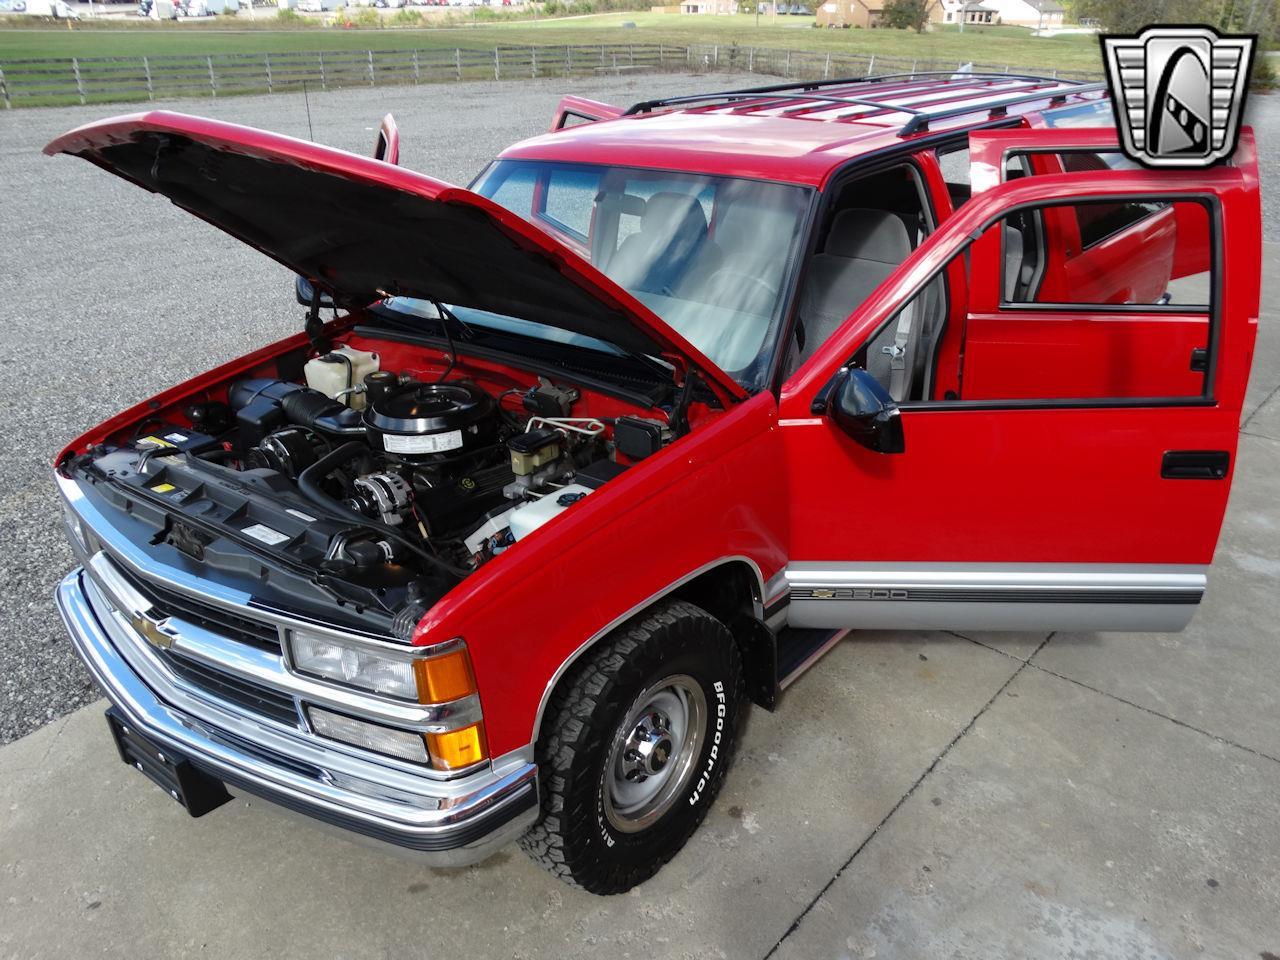 1995 Chevrolet Suburban (CC-1416993) for sale in O'Fallon, Illinois